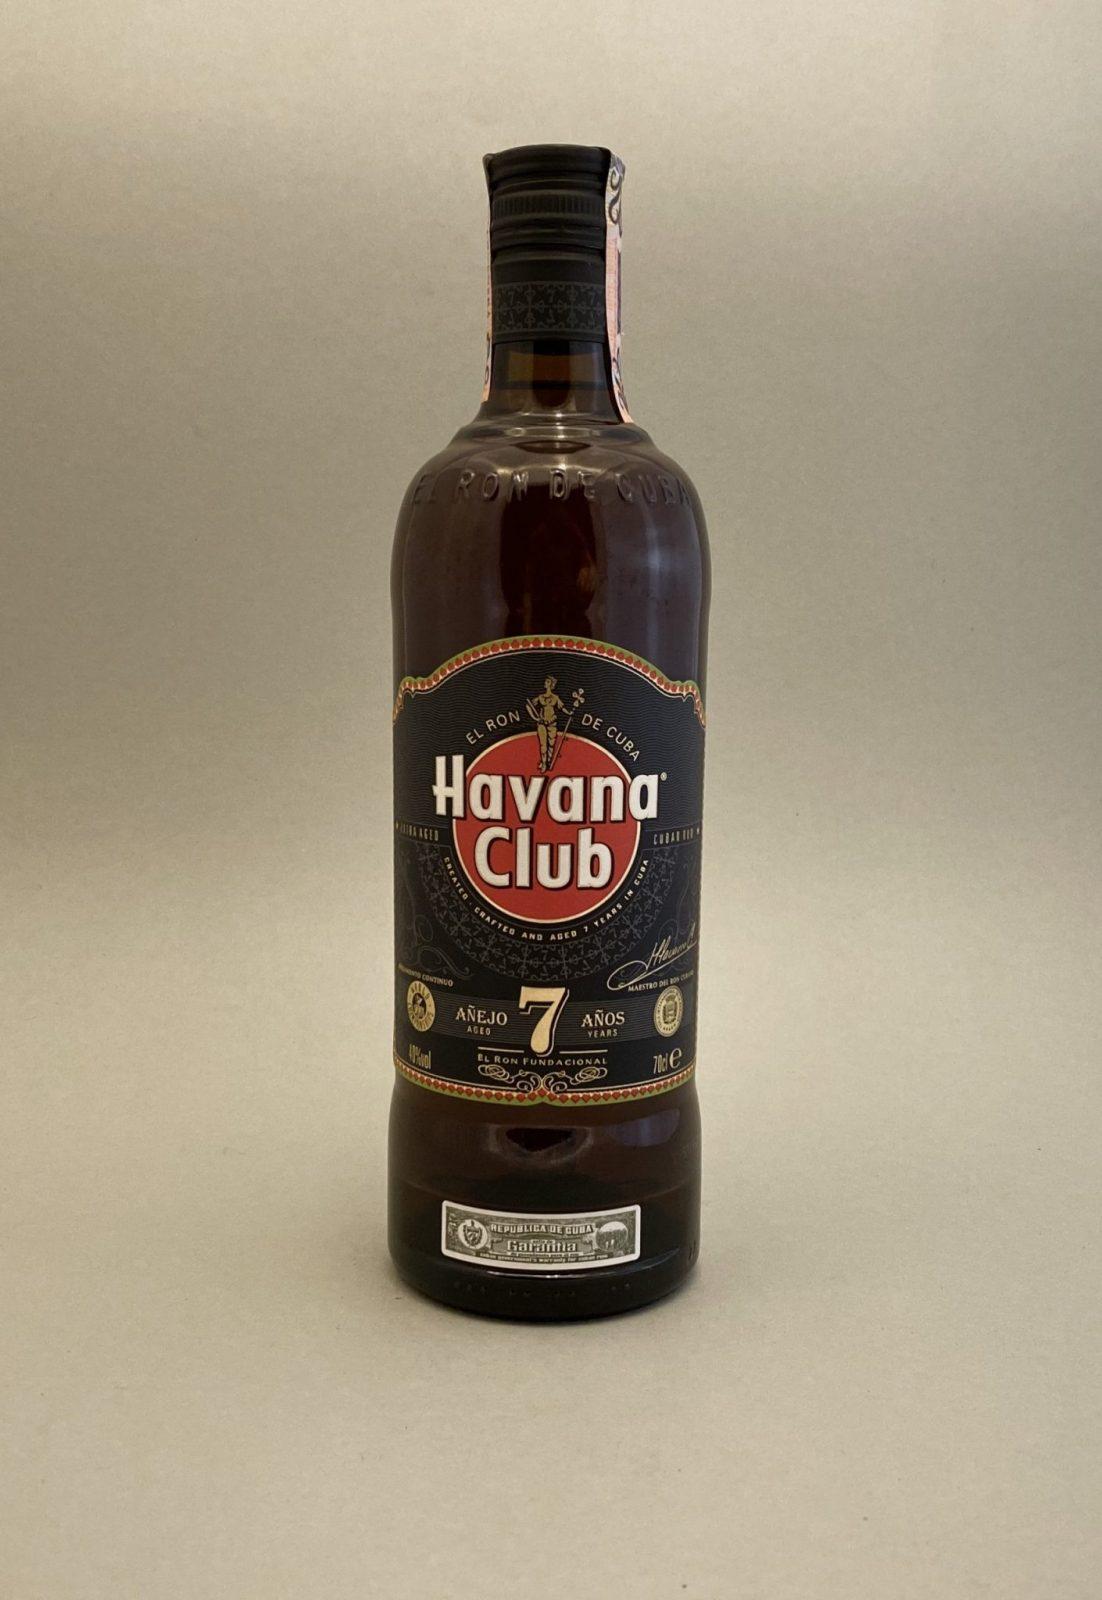 Havana Club 7 YO 40%, Bottleshop Sunny wines slnecnice mesto, petrzalka, rum, rumy, rozvoz alkoholu, eshop